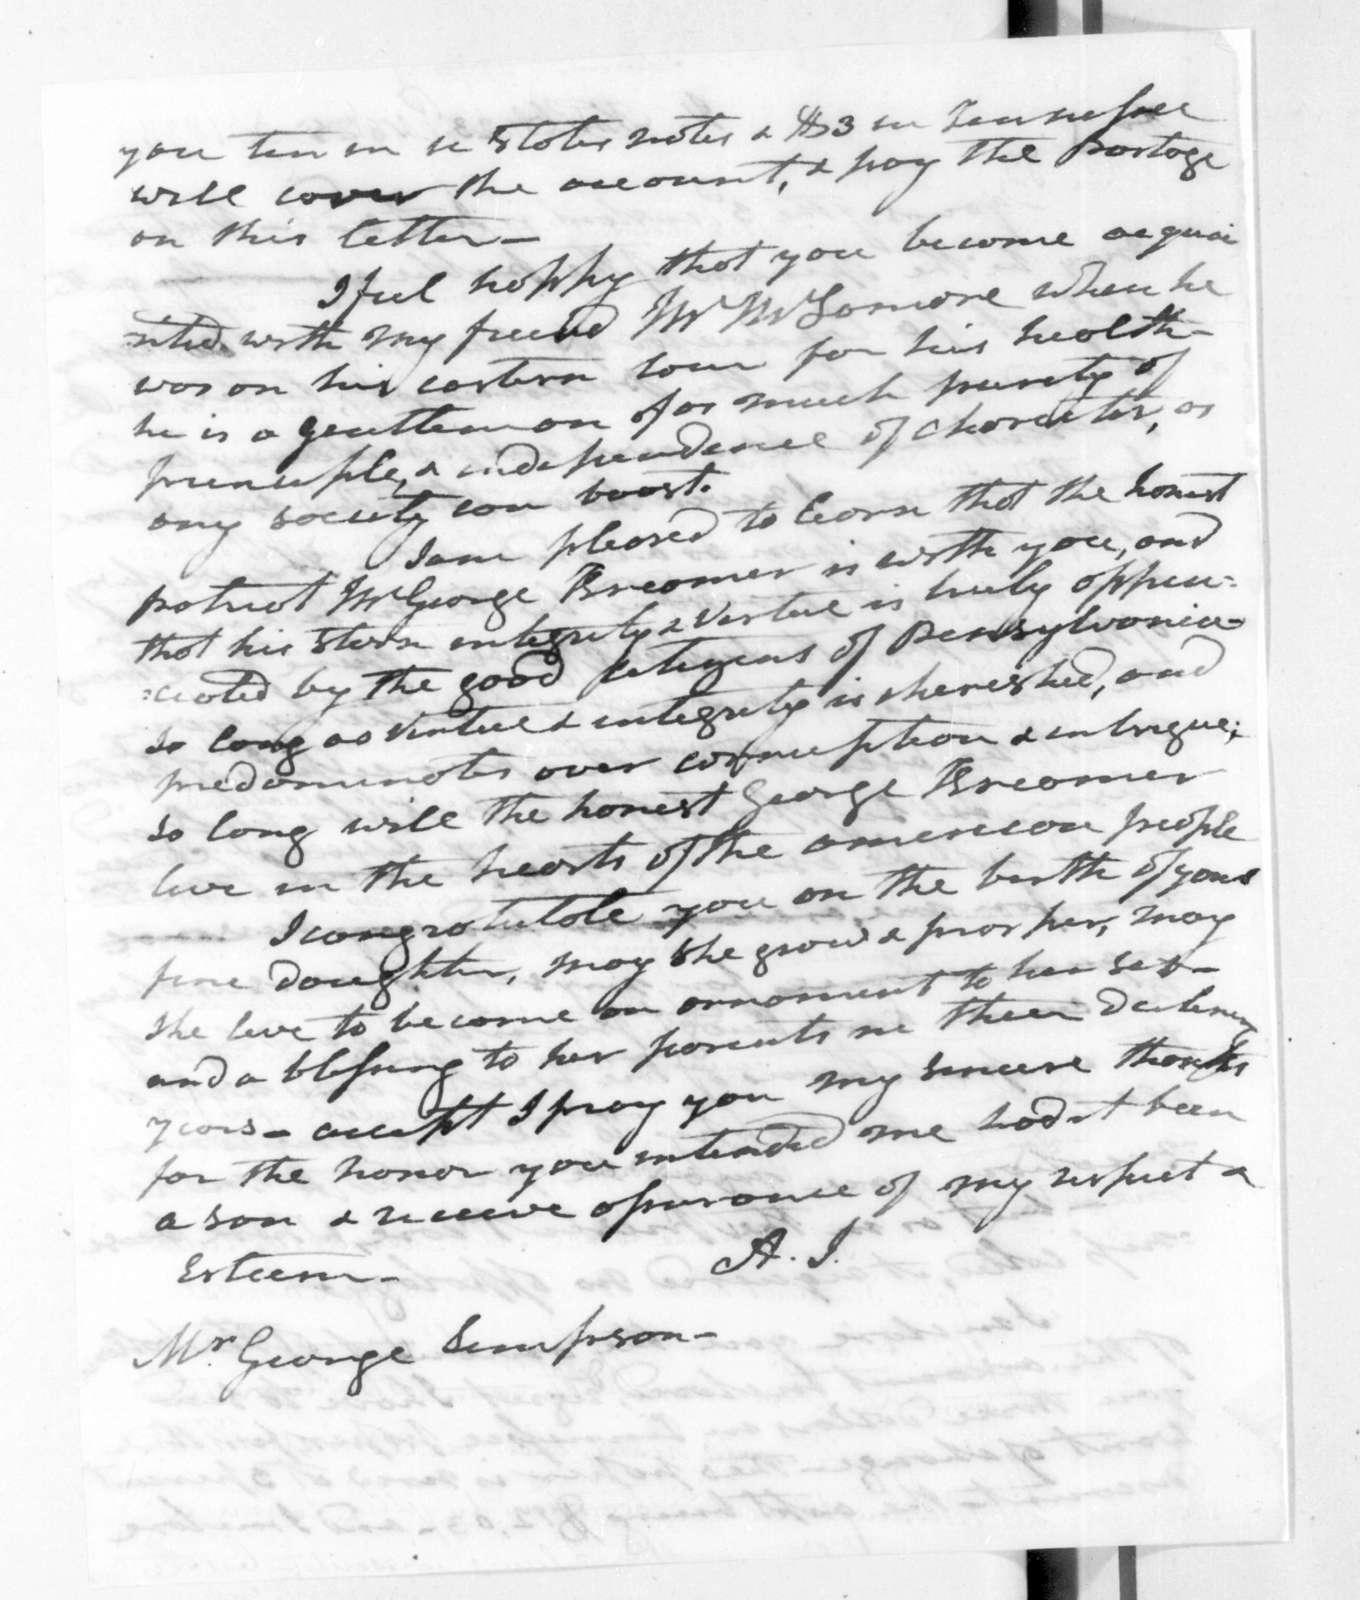 Andrew Jackson to Stephen Simpson, November 23, 1825